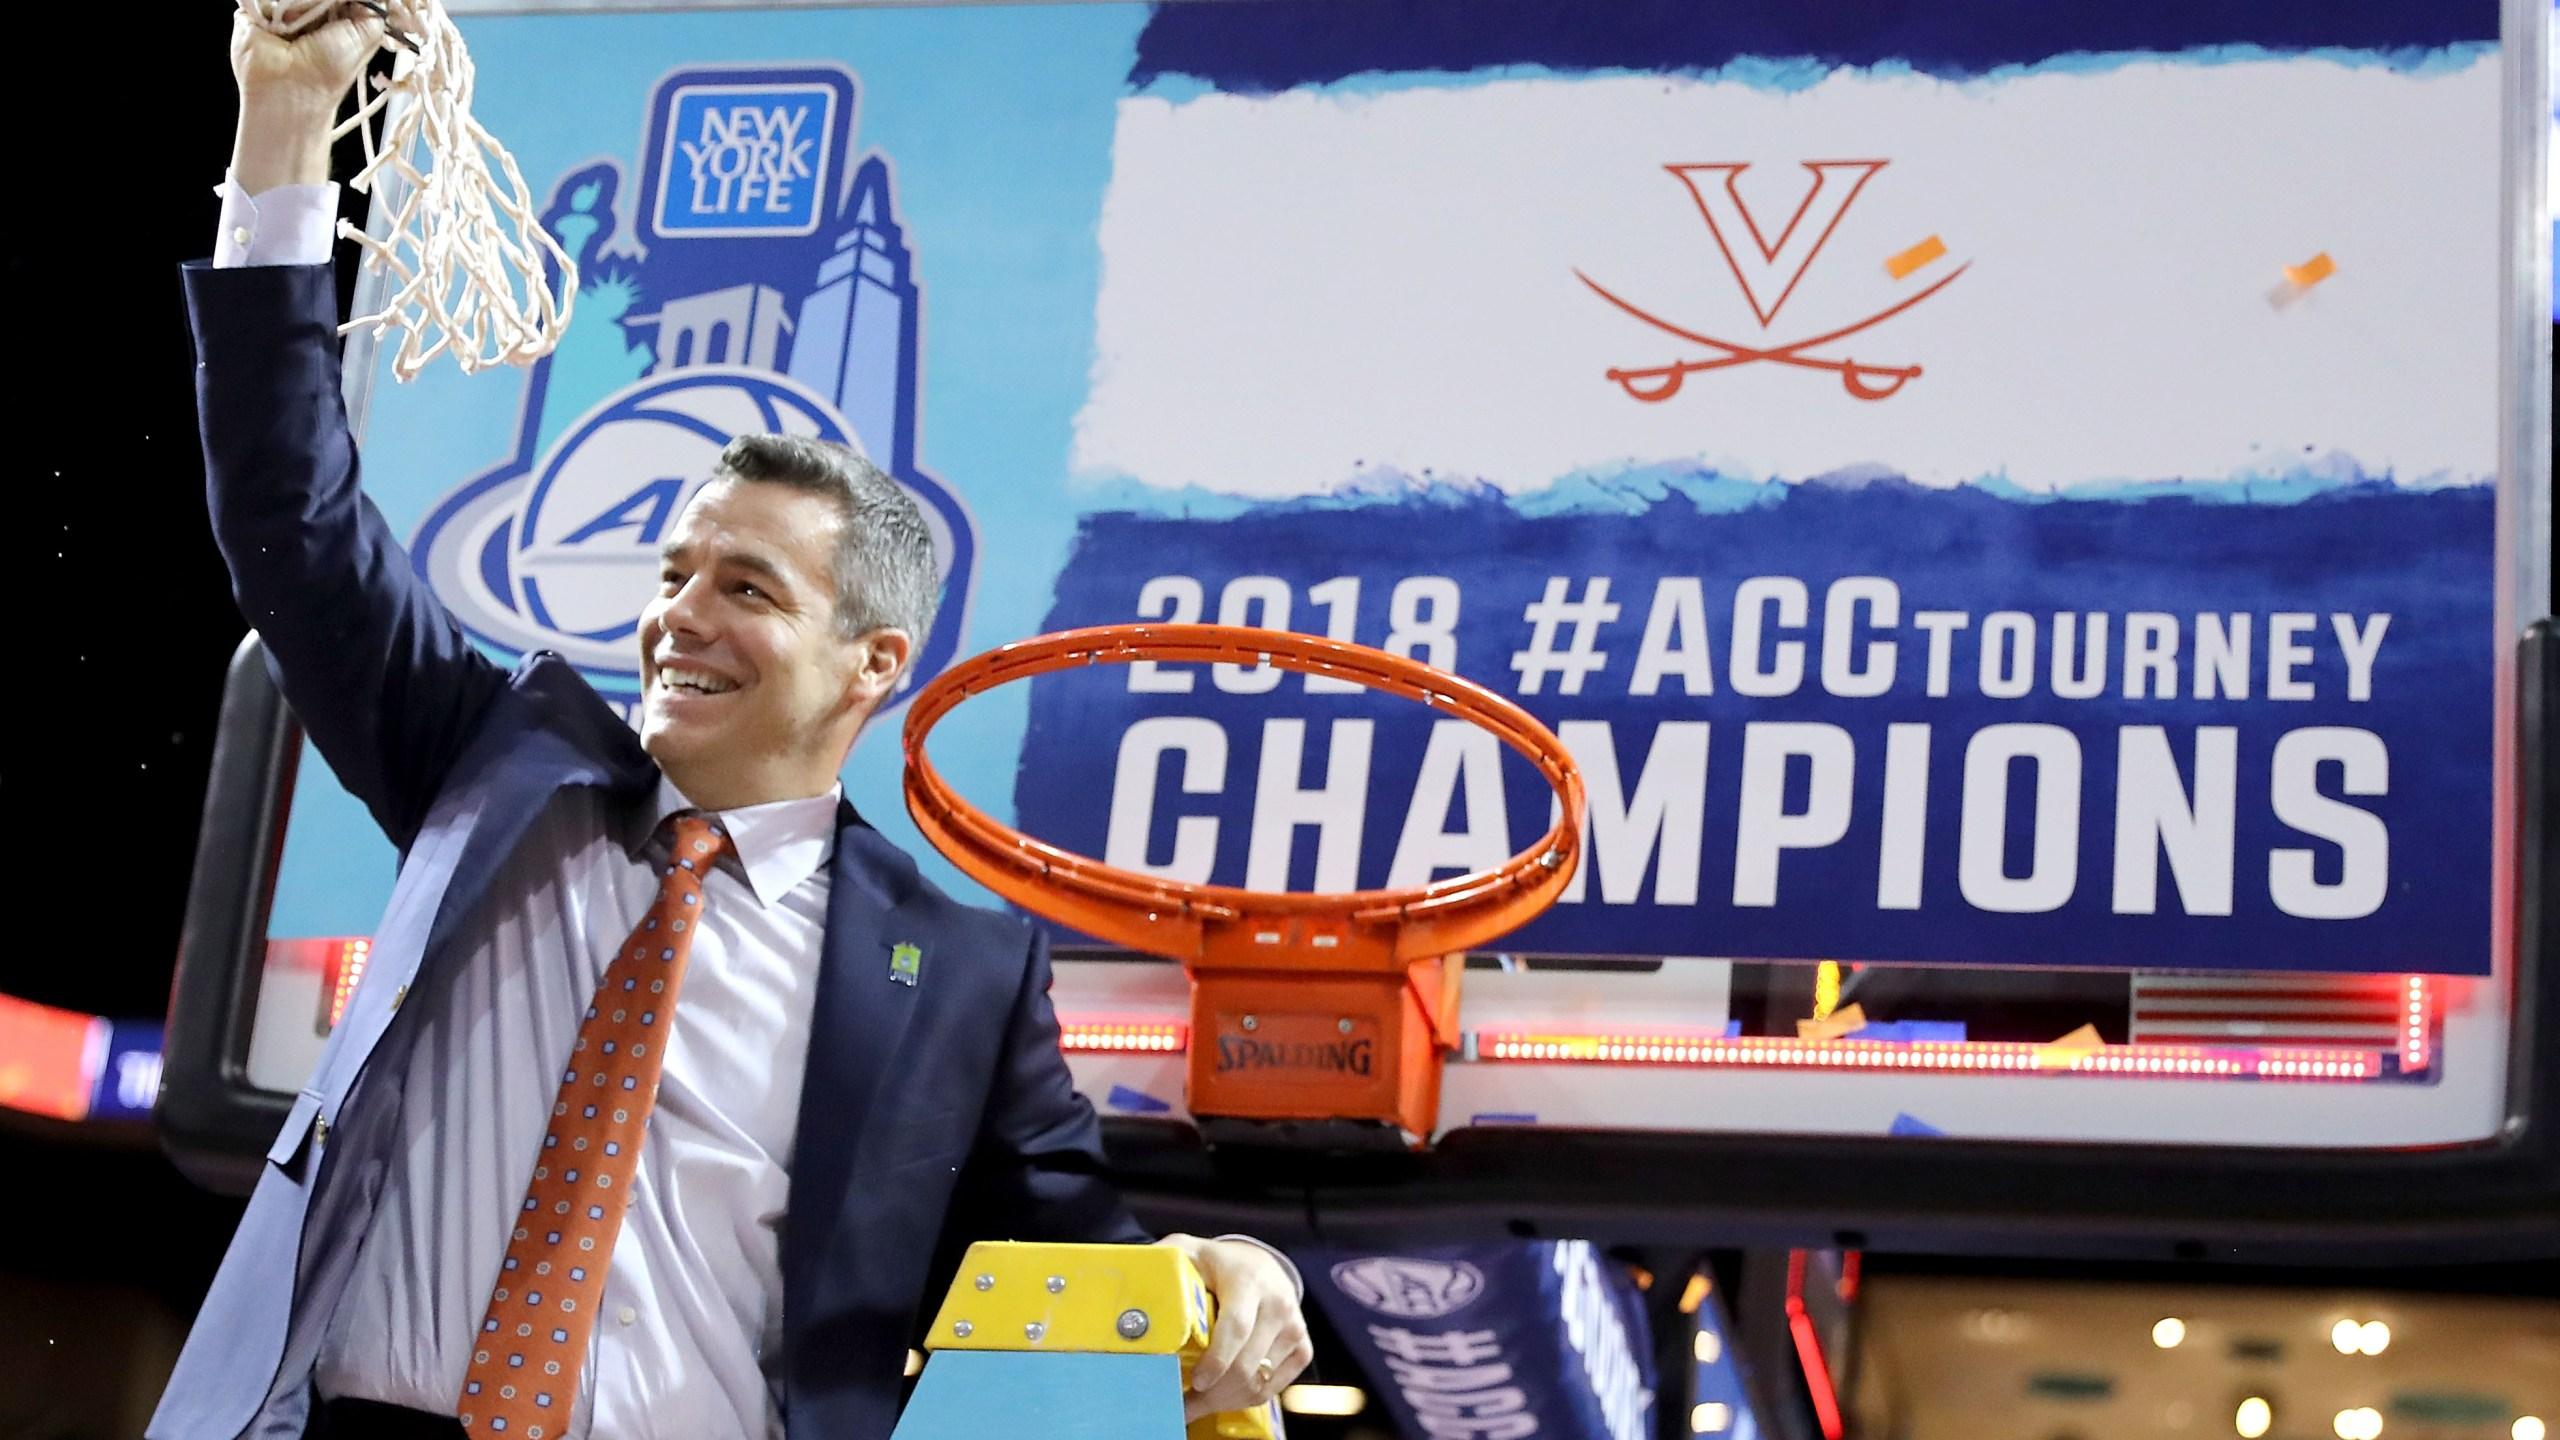 ACC Basketball Tournament - Championship_714387